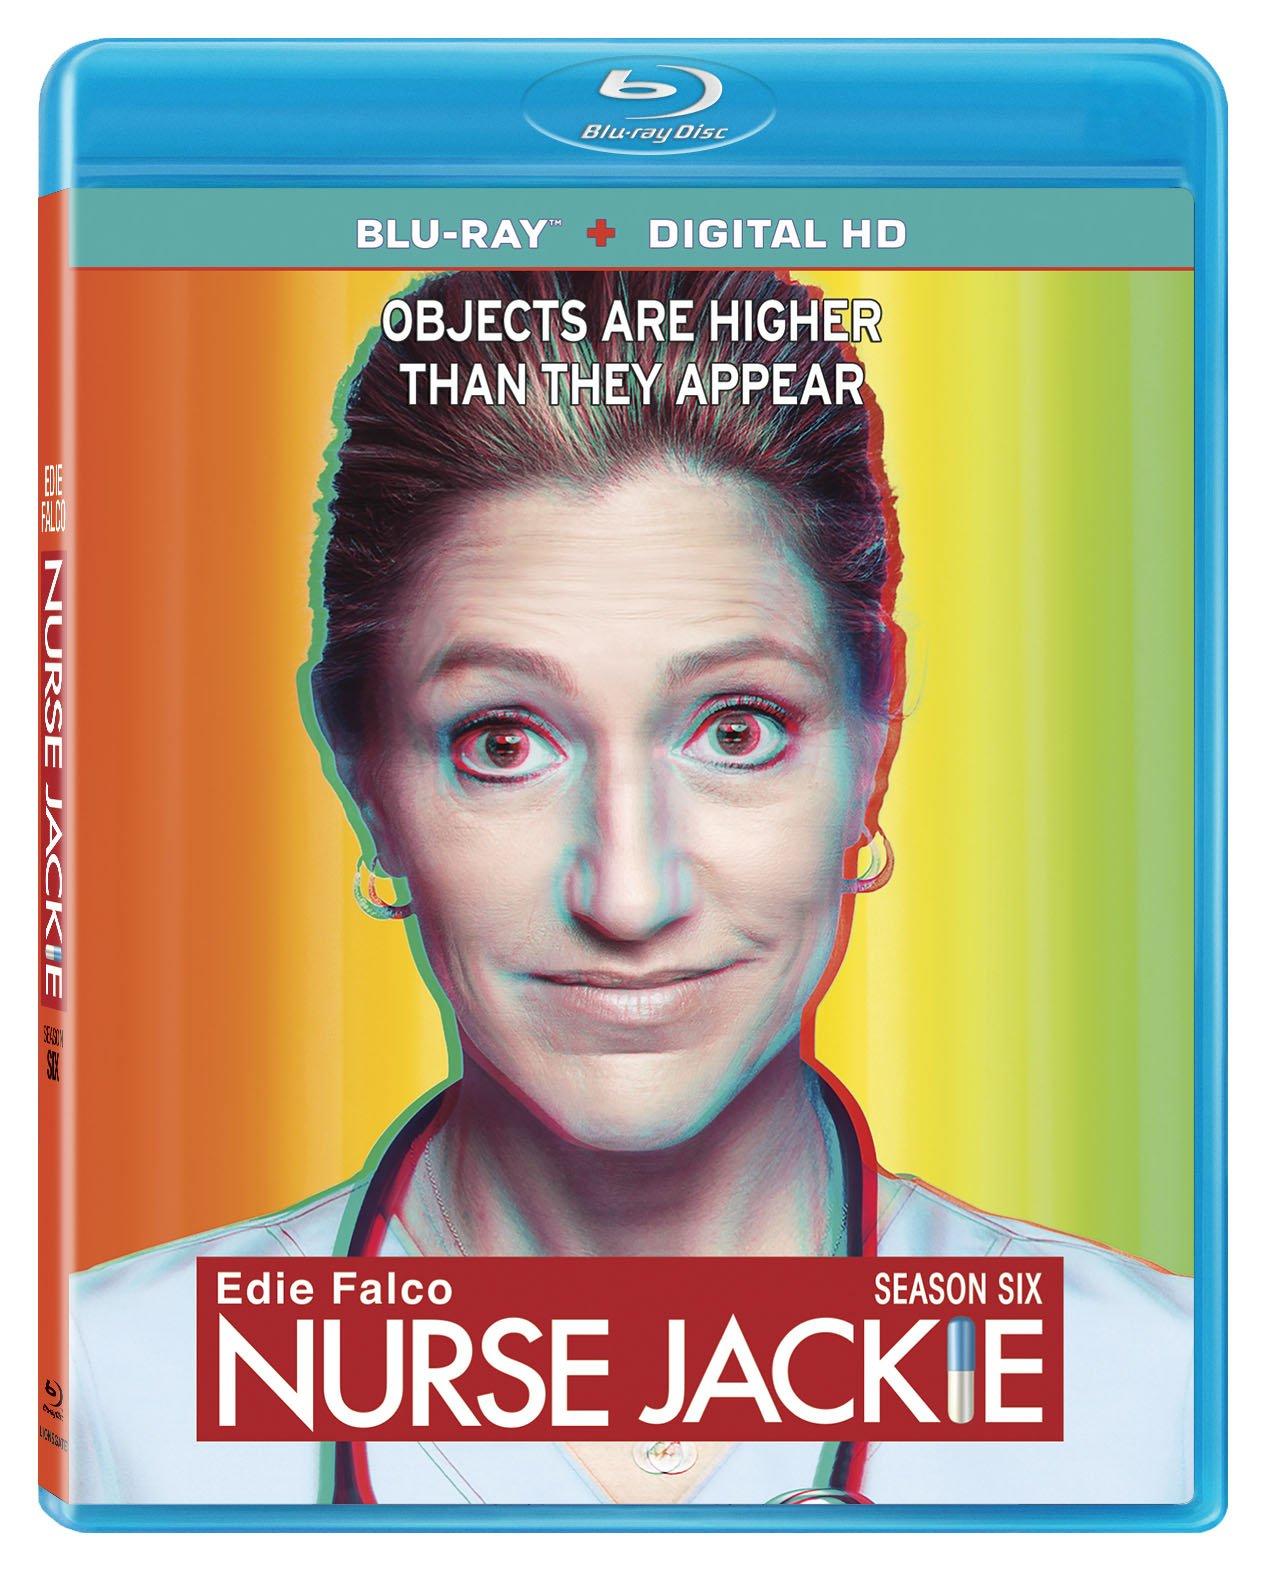 Blu-ray : Nurse Jackie Season 6 (2 Disc)